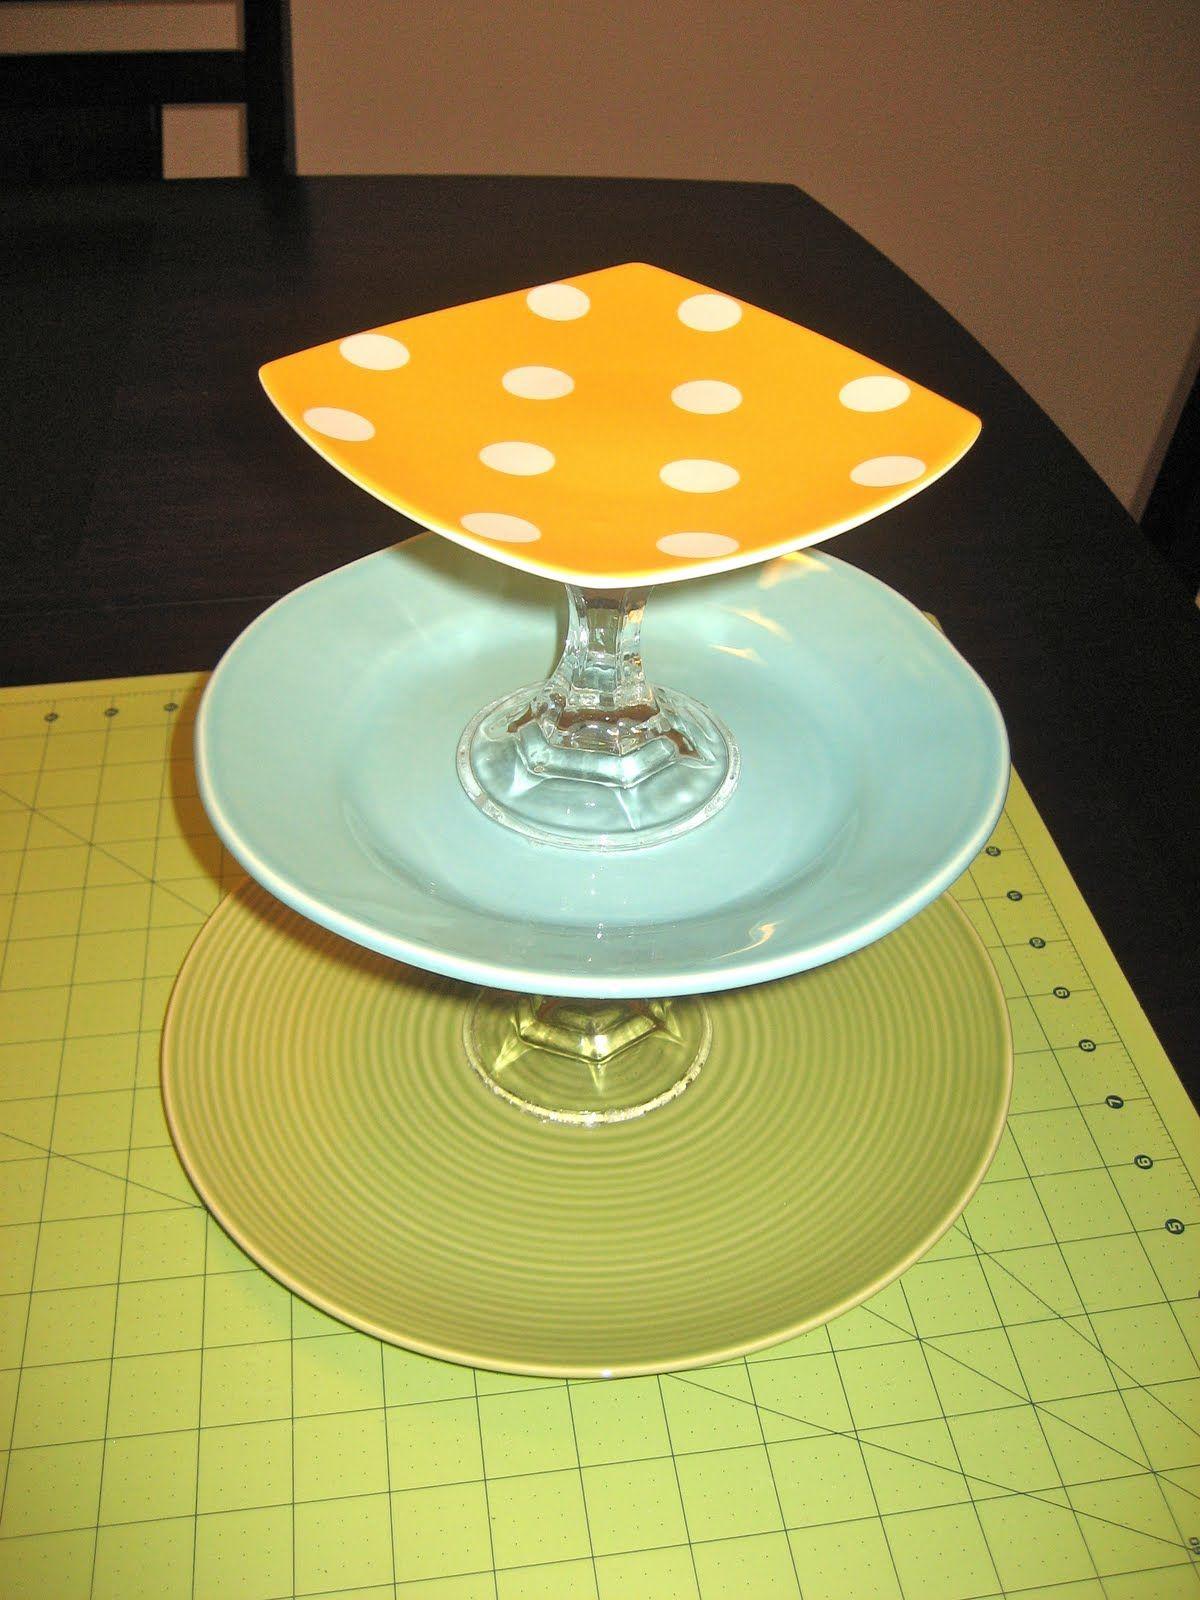 Mommas Like Me DIY Tiered Plates tutorial & Mommas Like Me: DIY Tiered Plates tutorial | Storage u0026 Displays ...